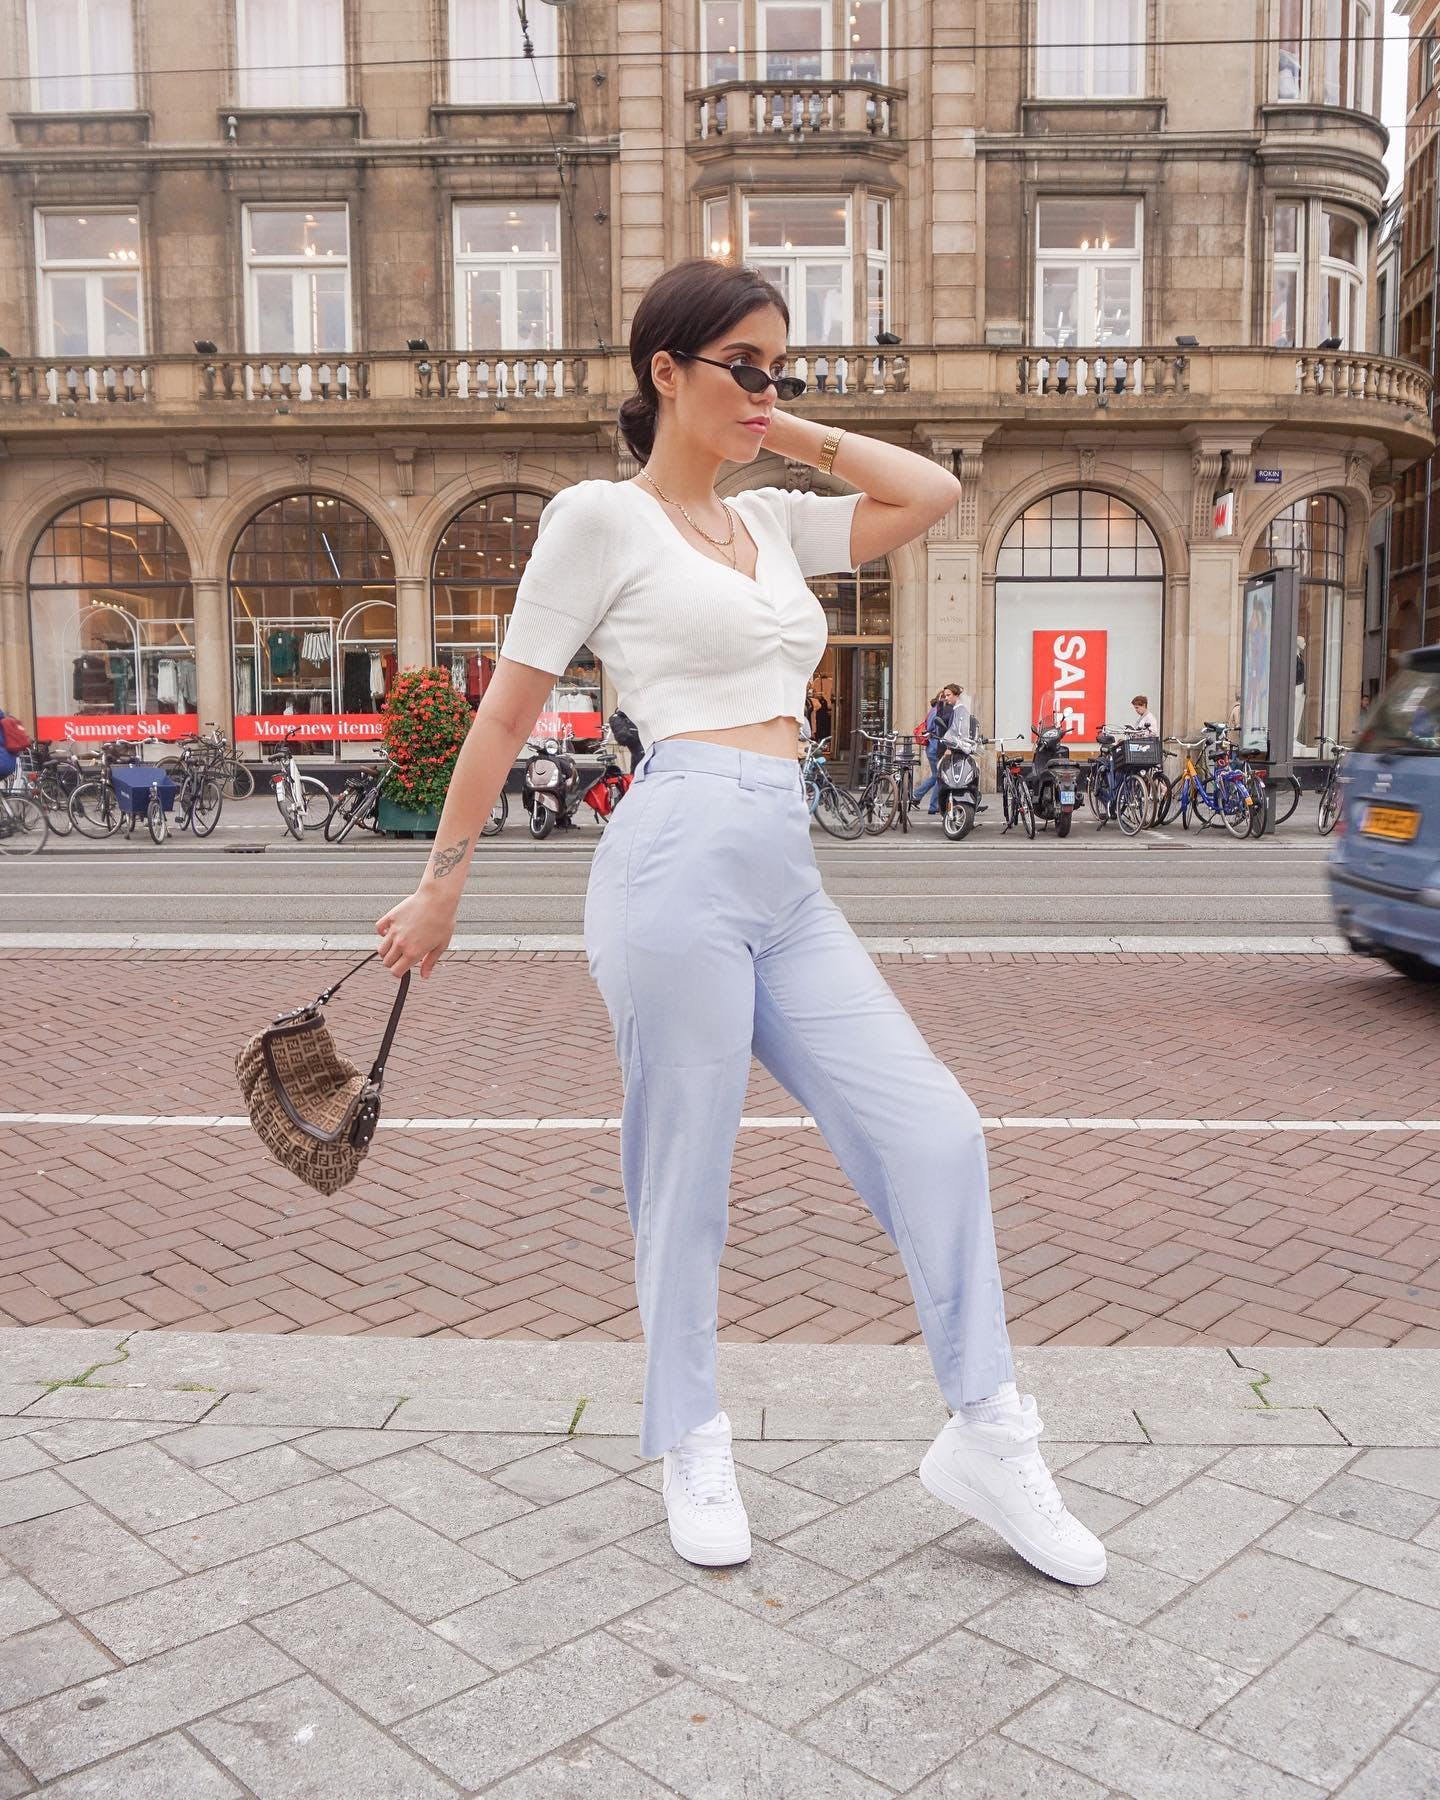 Koop adidas Originals Gazelle Og W Night IndigoFtwr White